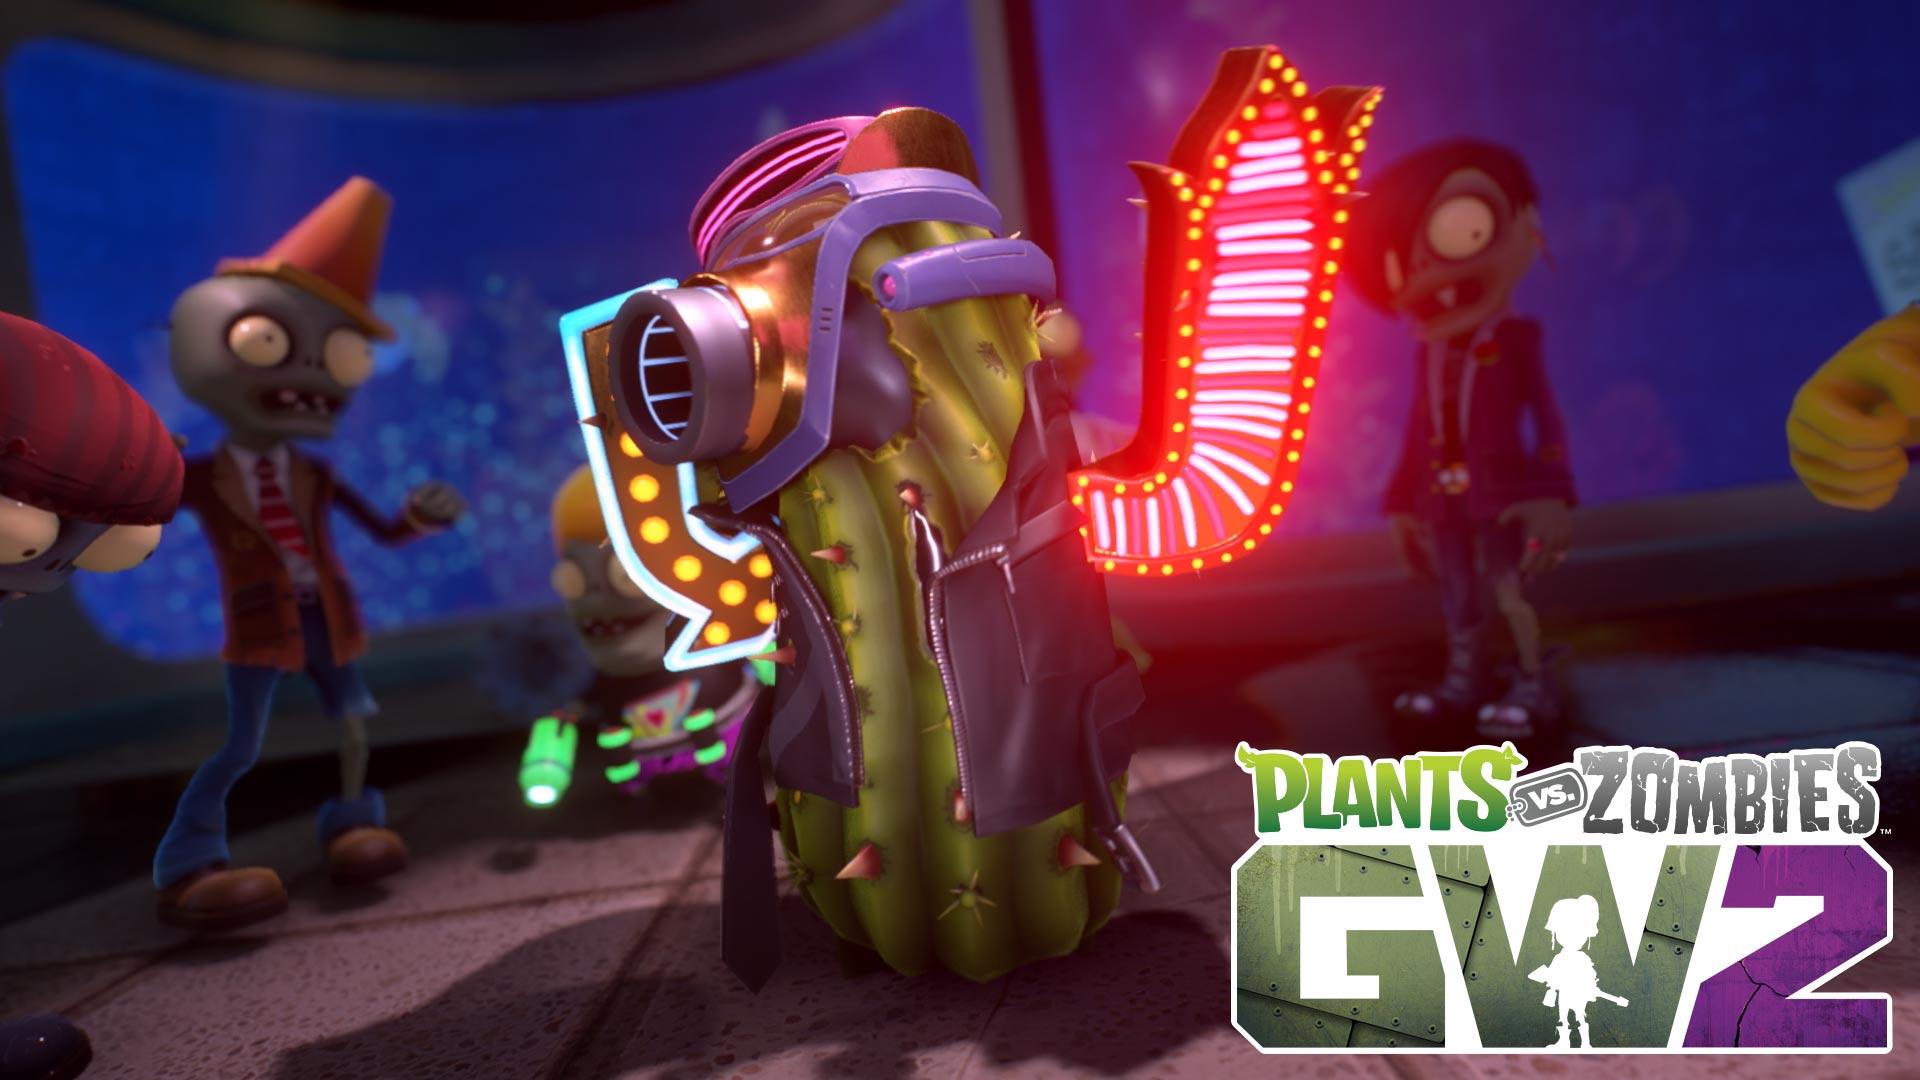 Free Plants vs. Zombies Garden Warfare 2 Update Brings New Content